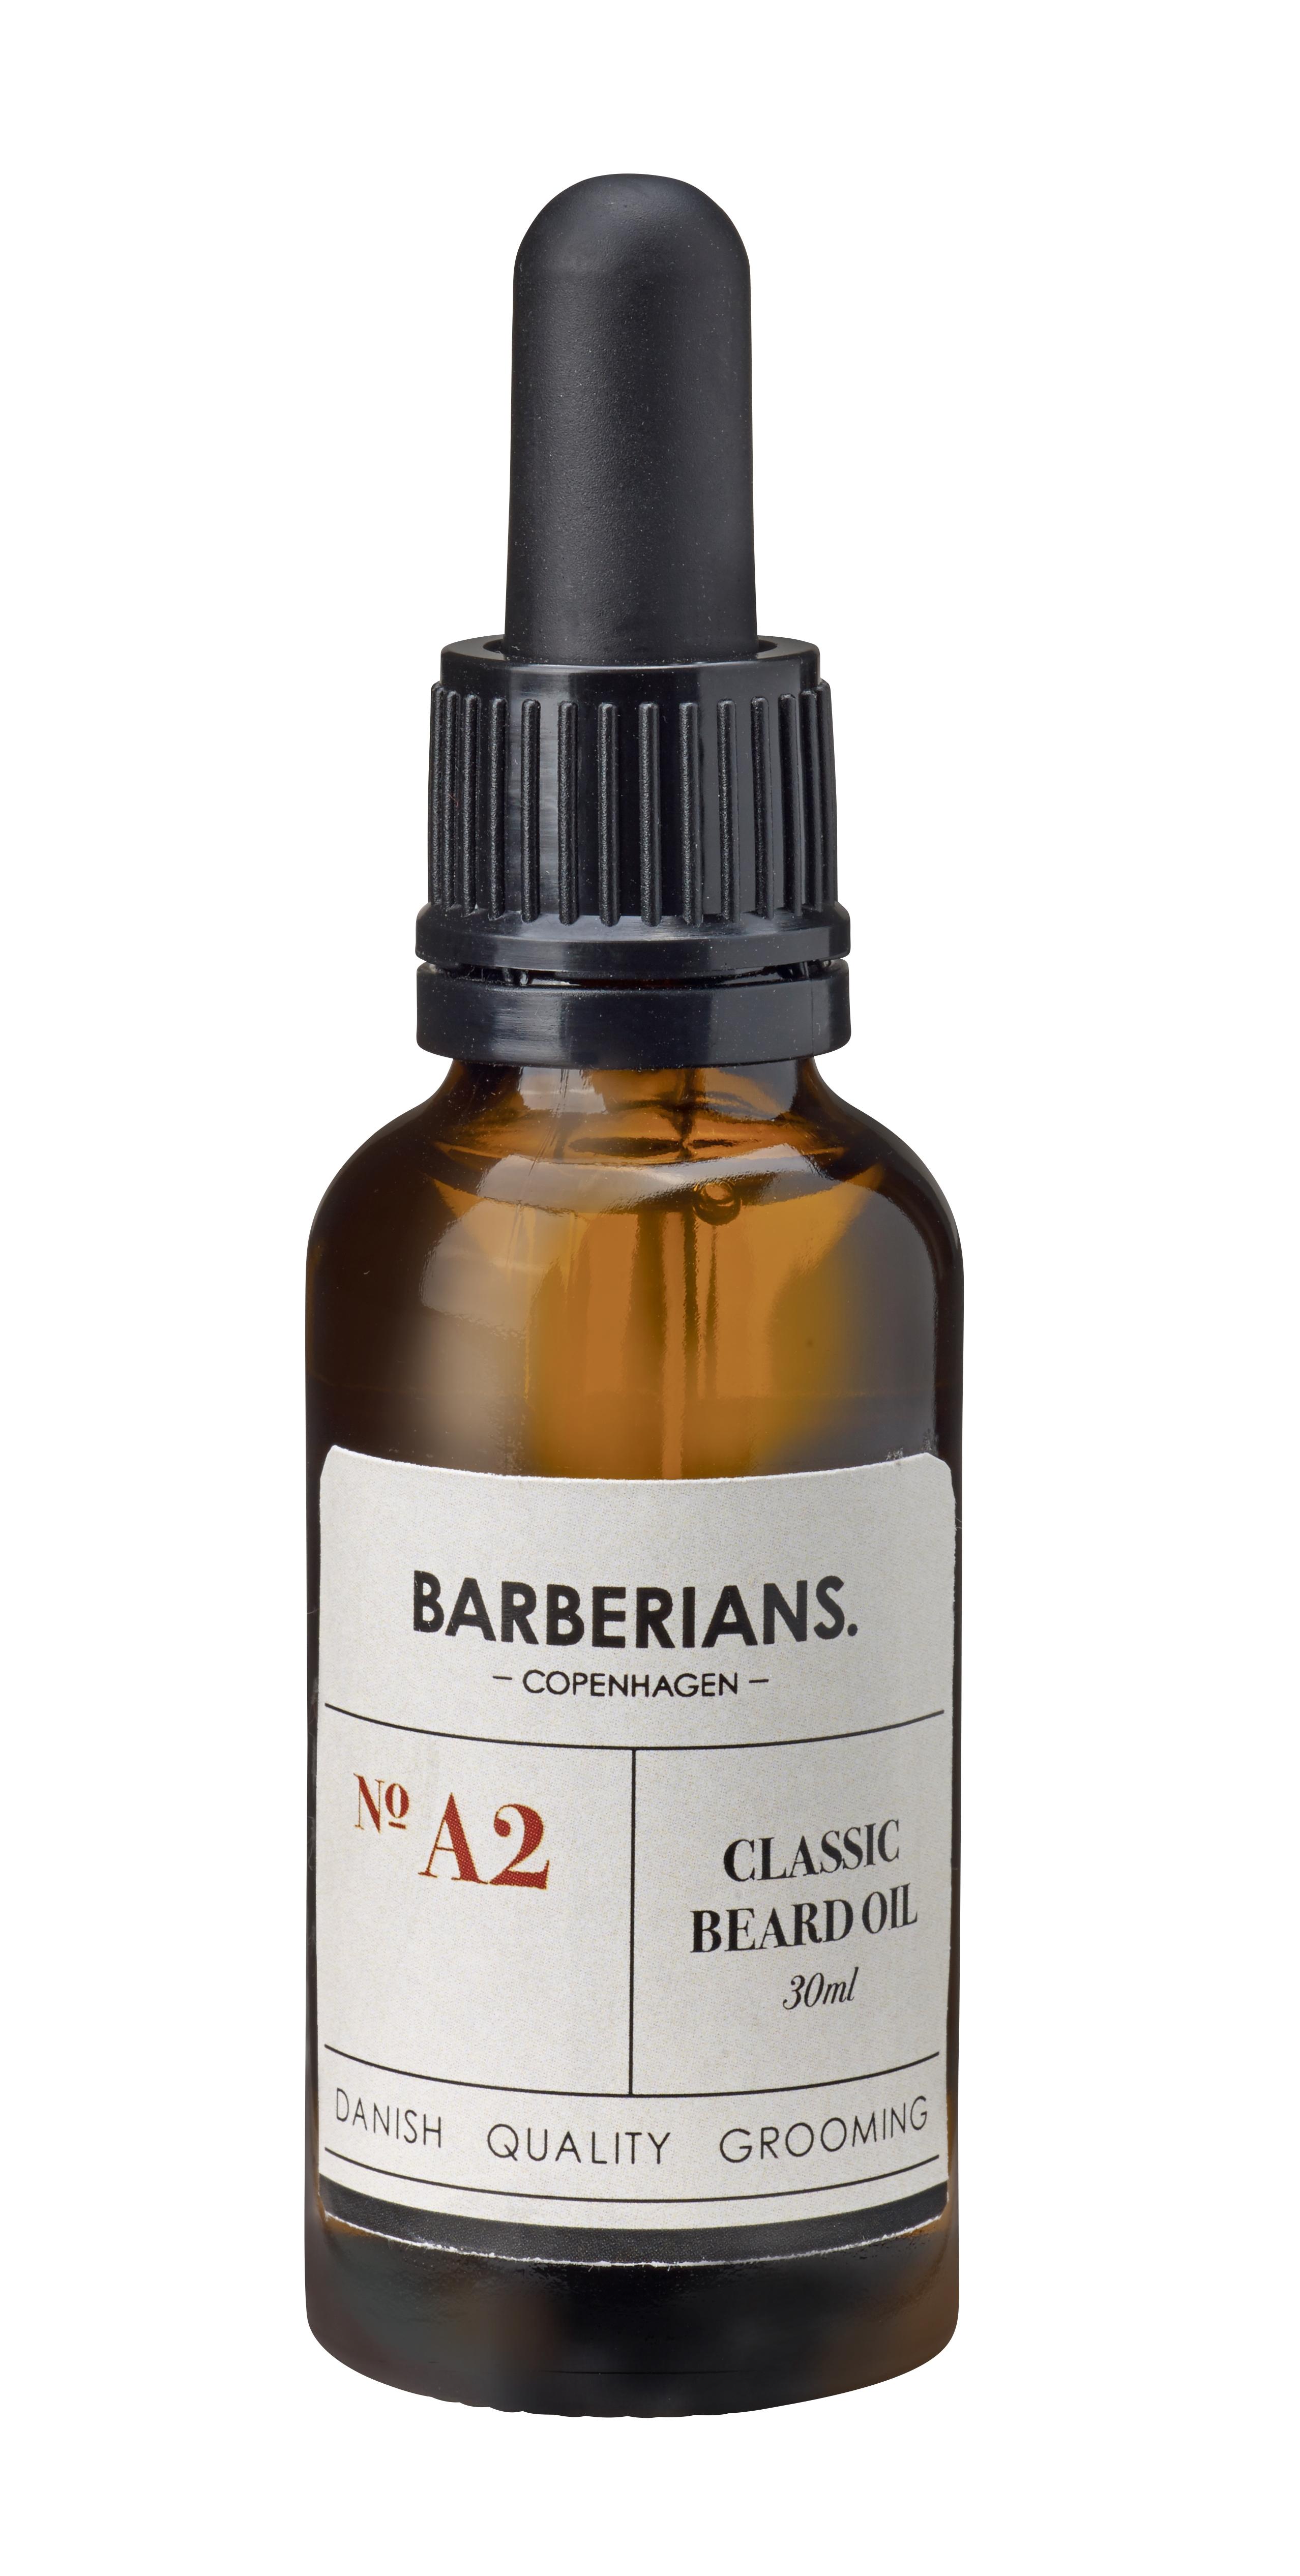 Barberians Classic Beard Oil, 30 ml